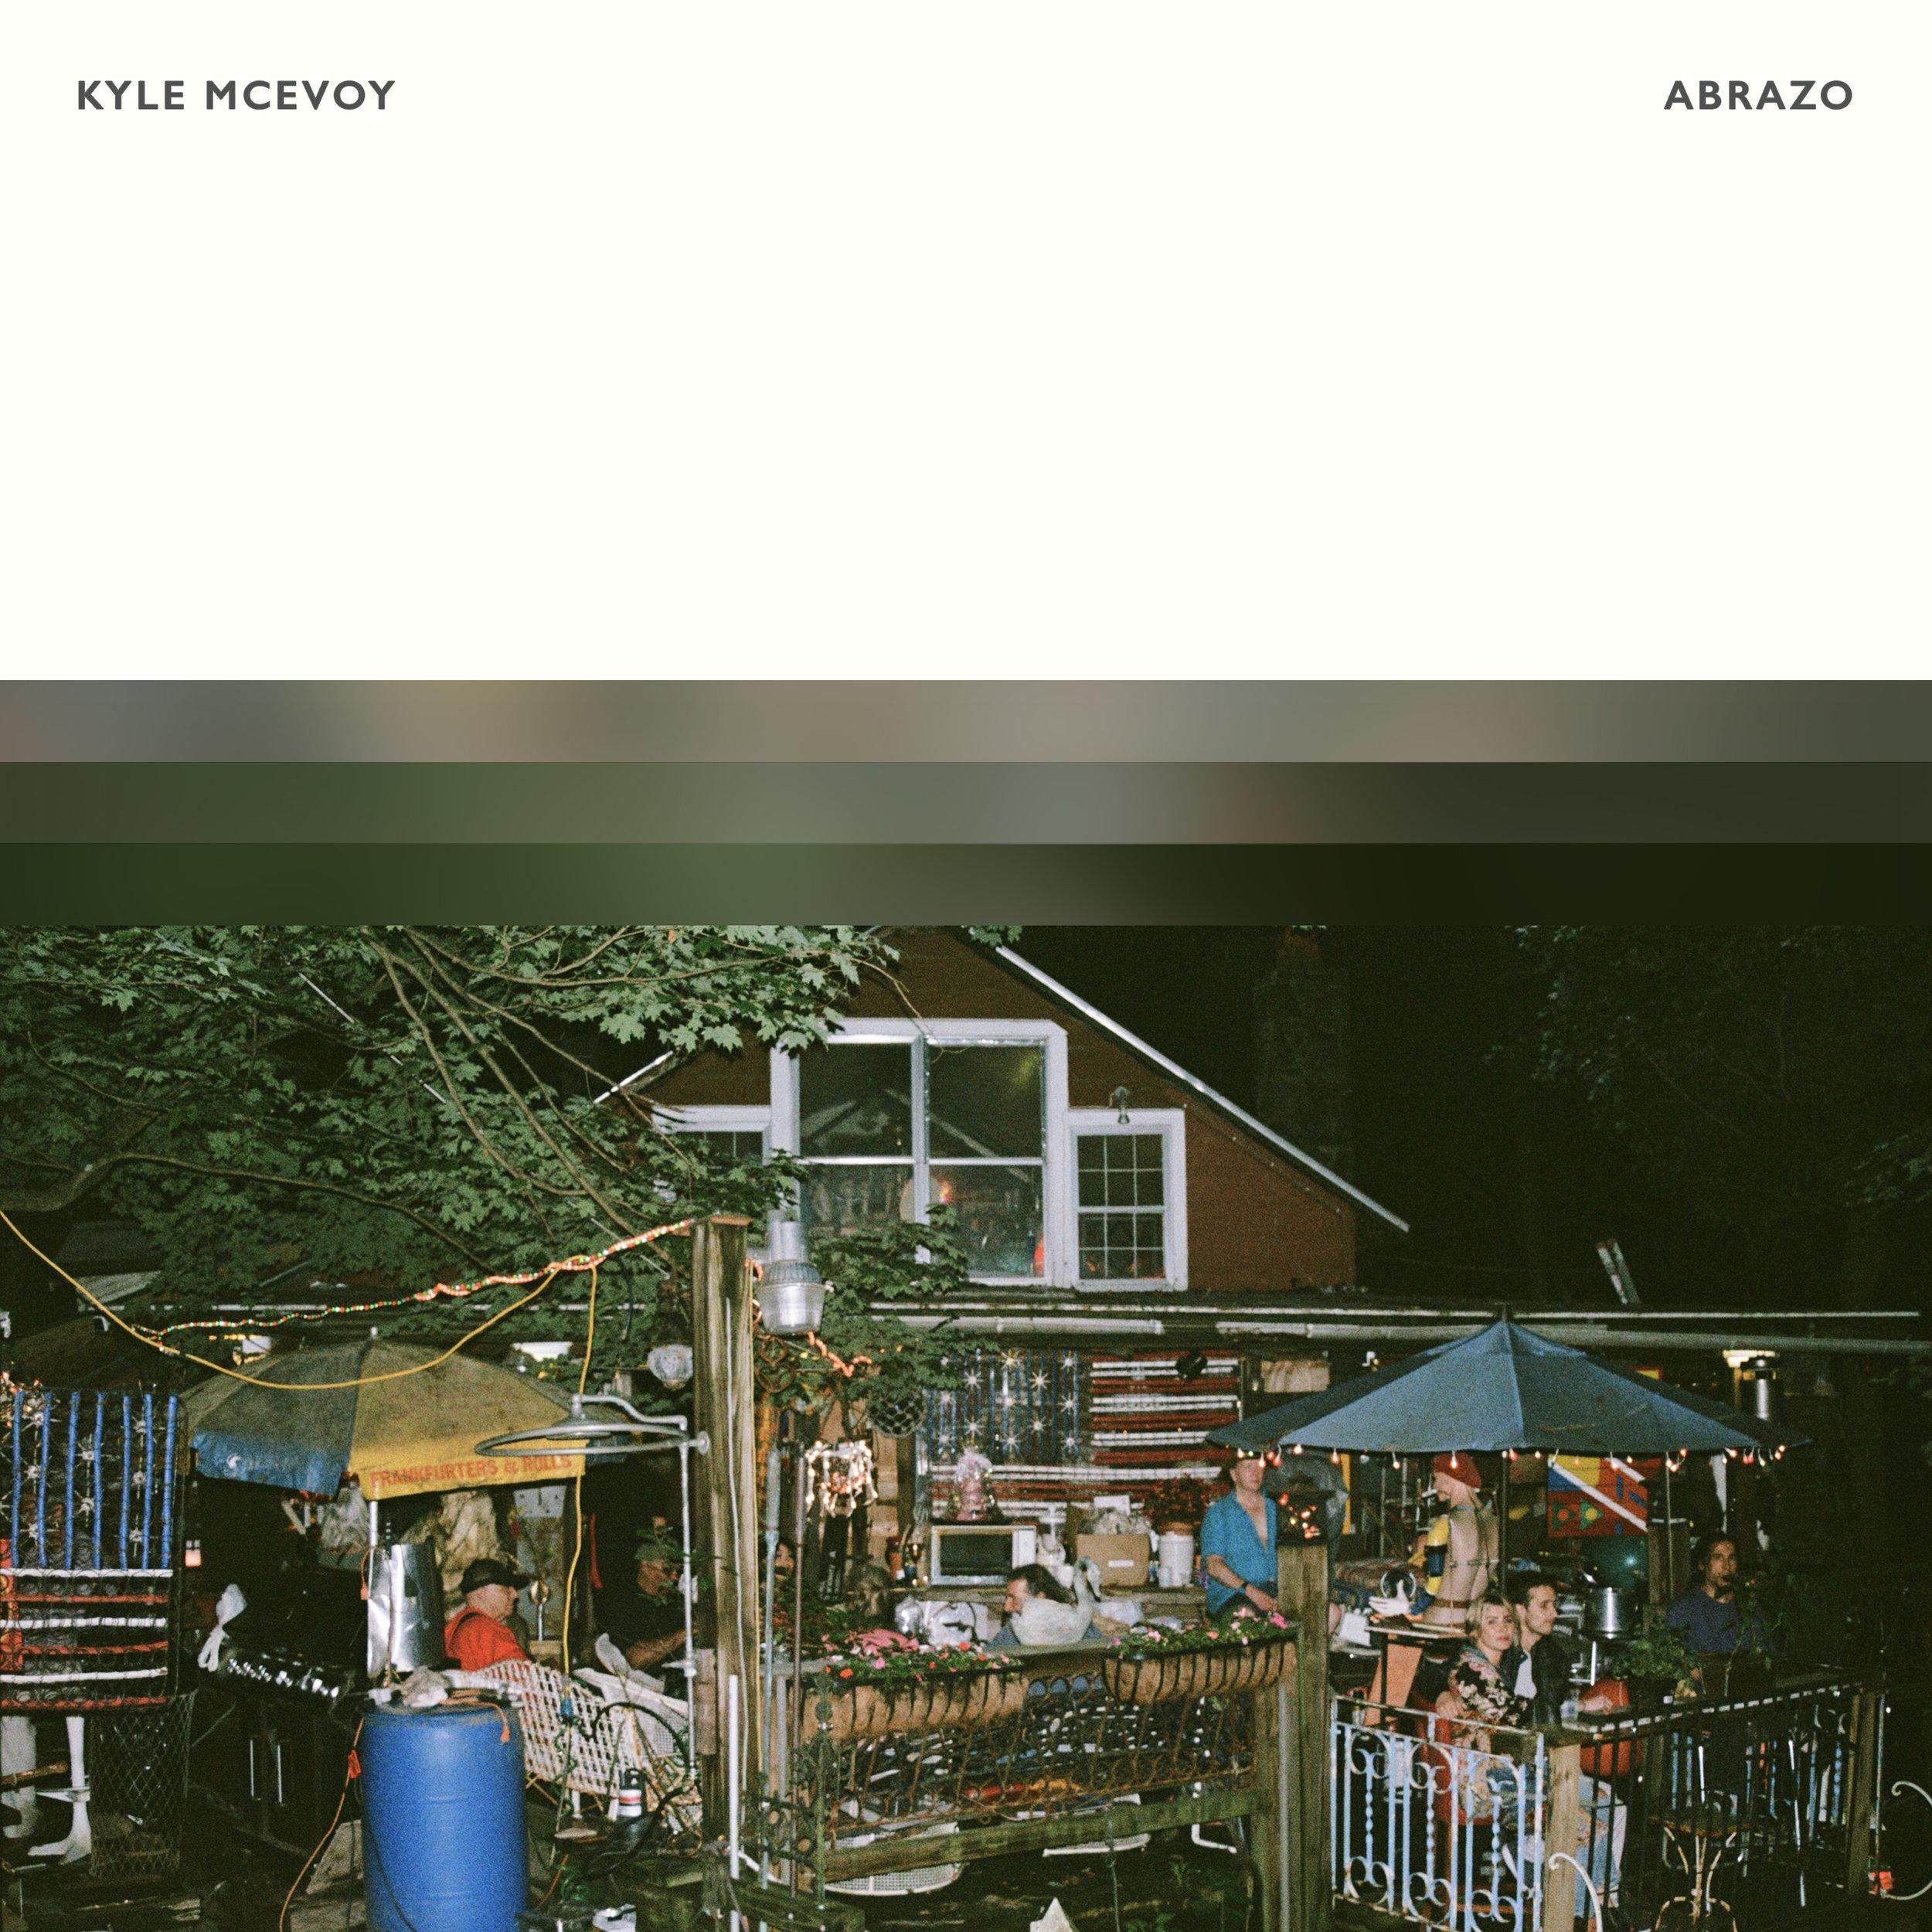 Kyle McEvoy - Abrazo